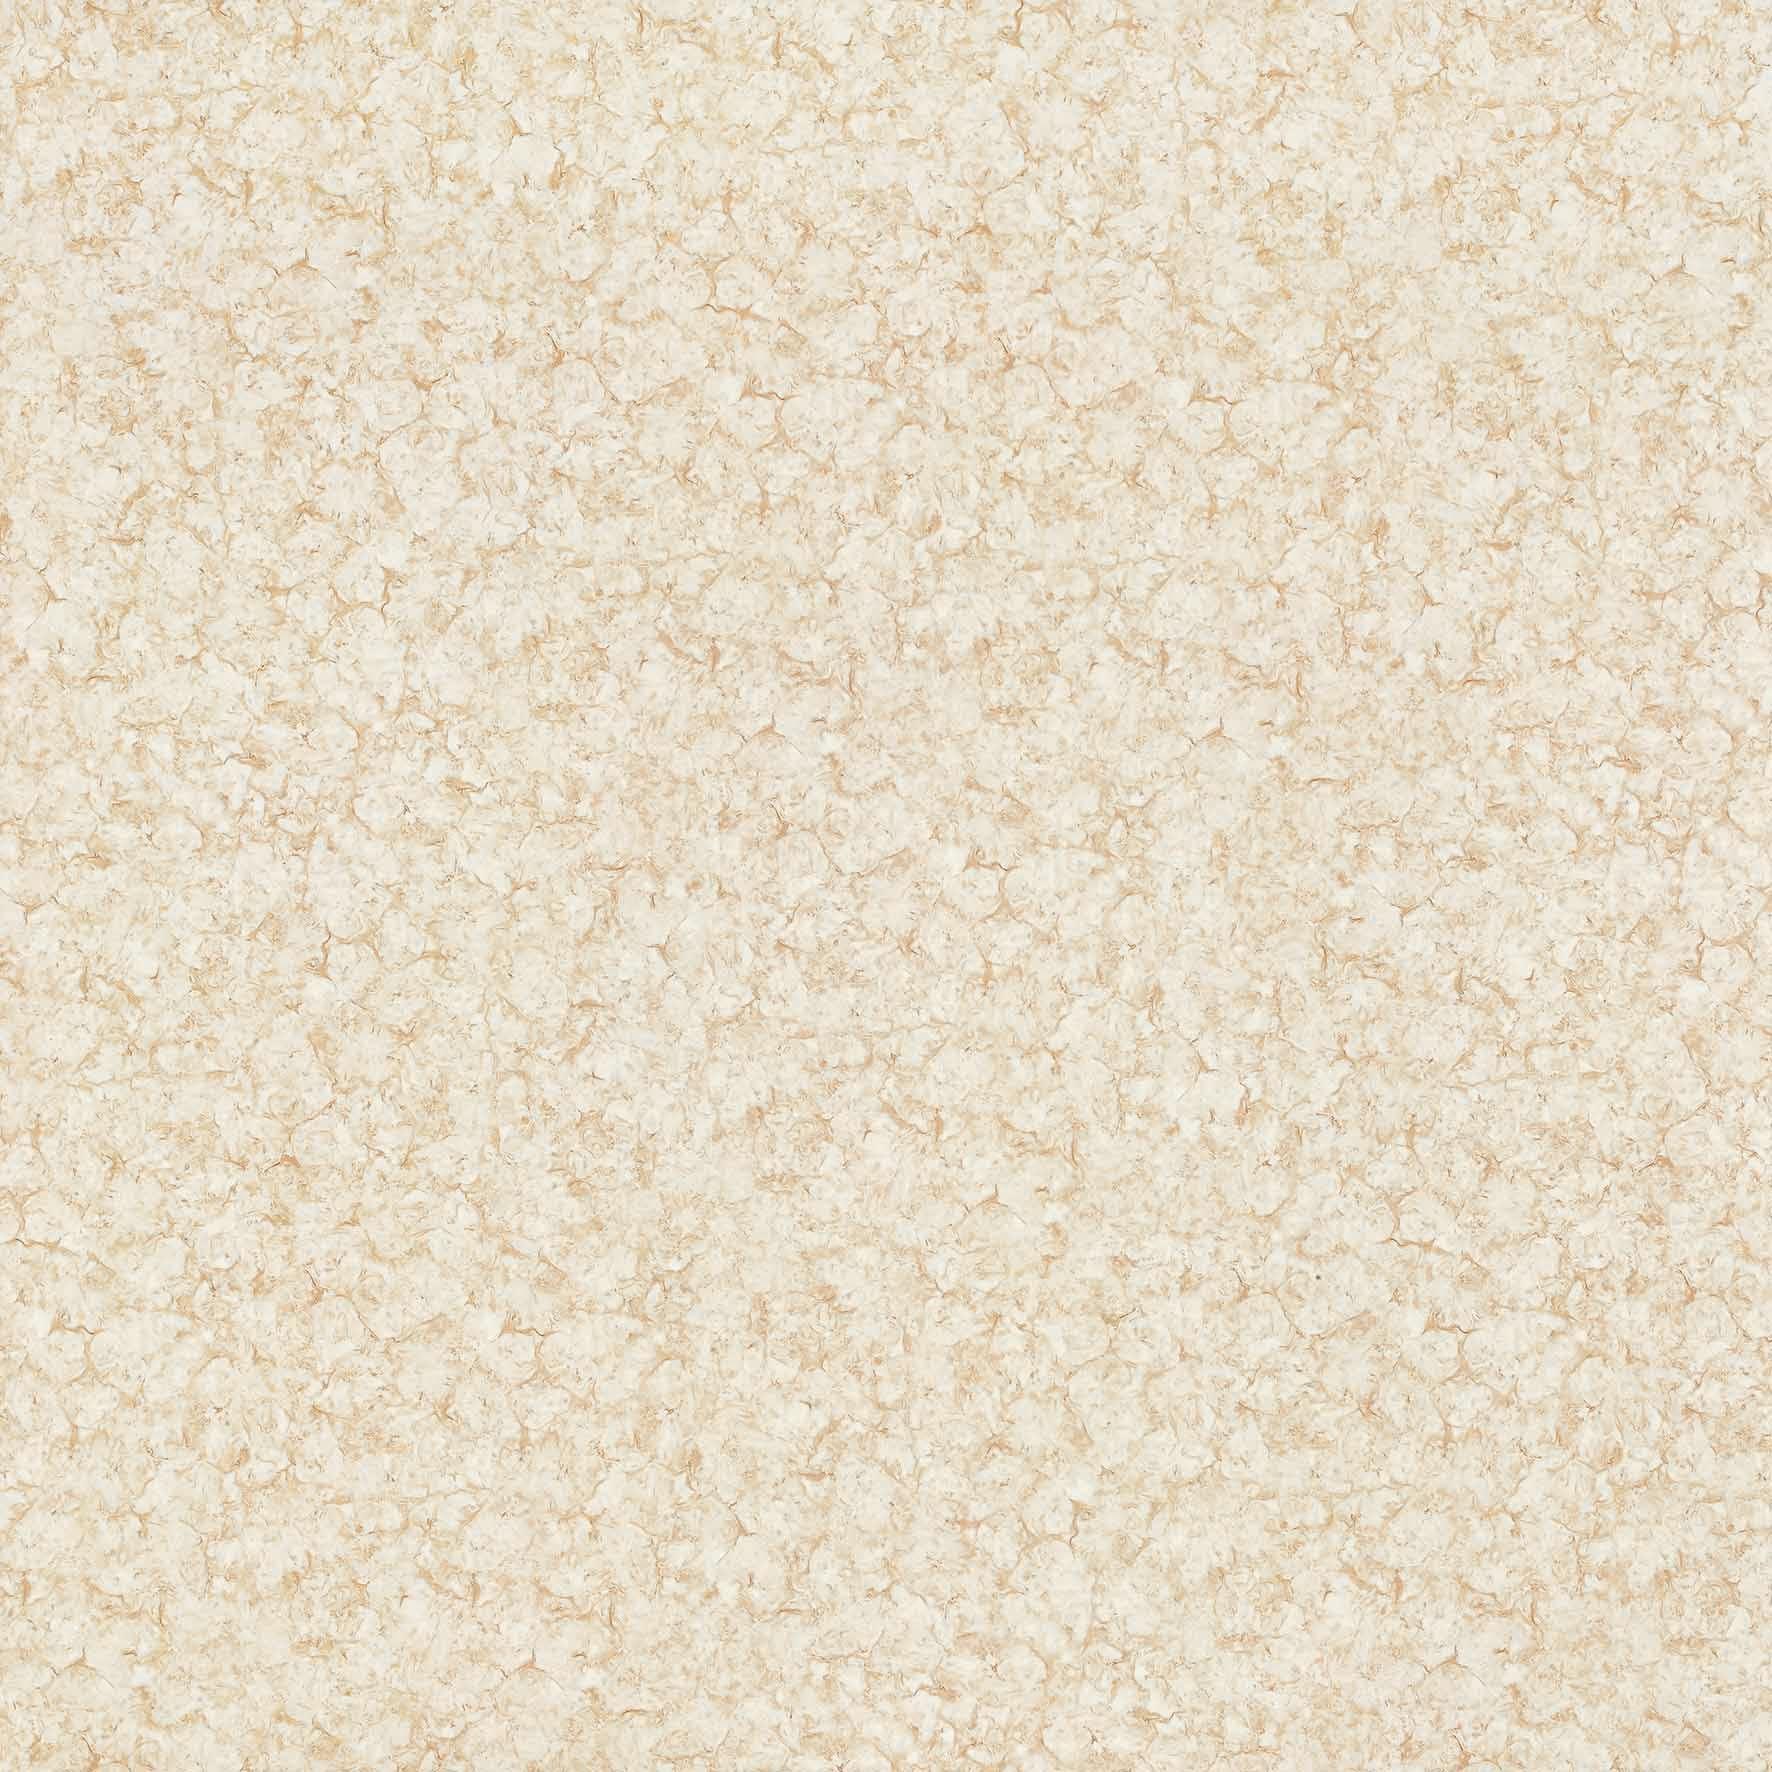 China super smooth glazed porcelain tileceramic tilefloor tile super smooth glazed porcelain tileceramic tilefloor tileflooringbuilding materialmarble stone tileglossymattno slip600600mm800800mm dailygadgetfo Choice Image